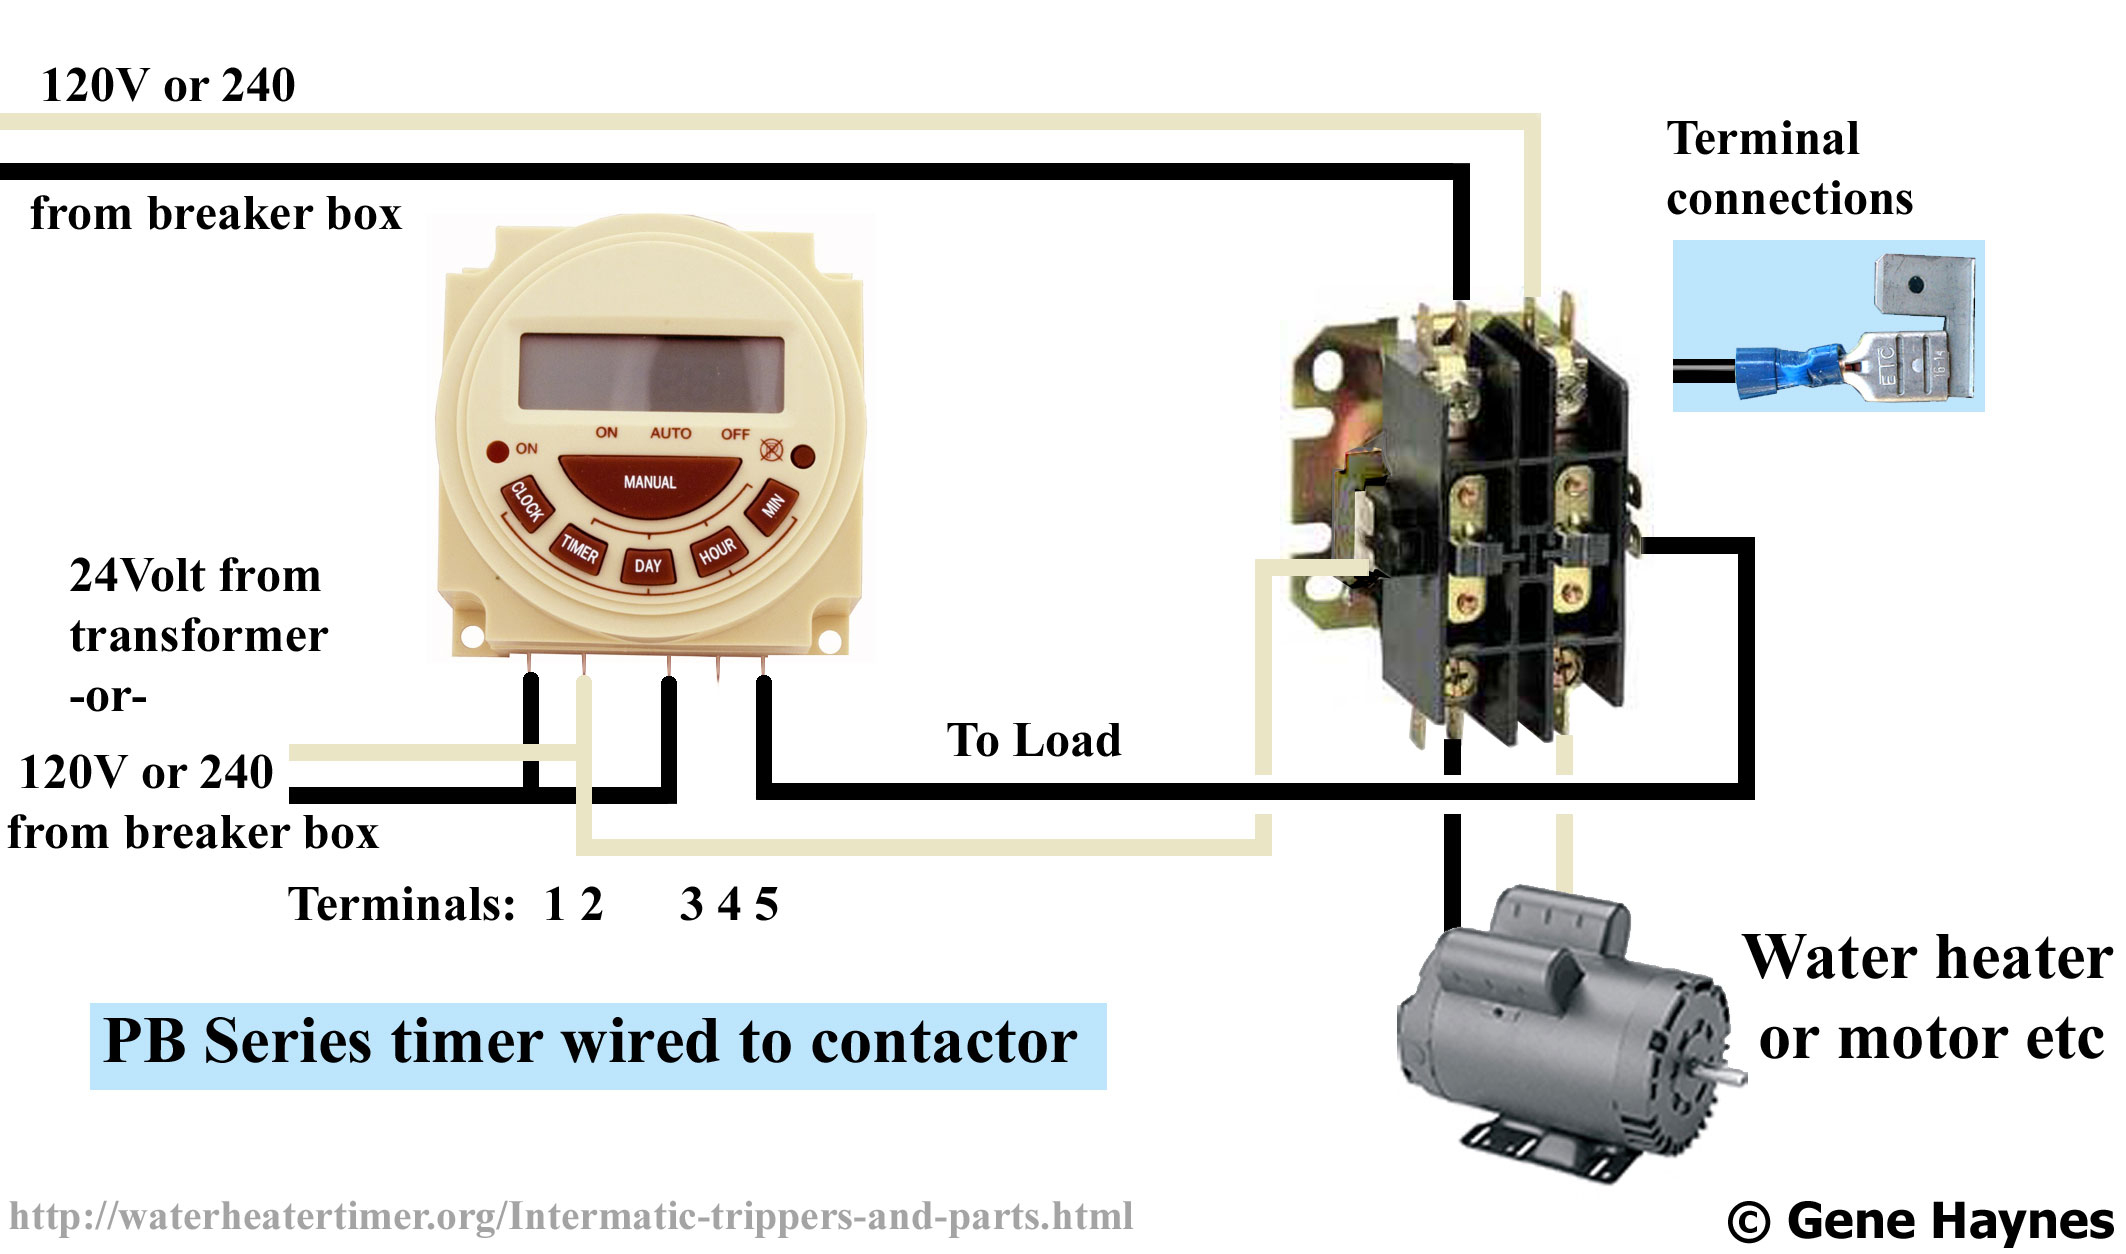 Dc Contactor Wiring | Wiring Diagram - 24 Volt Transformer Wiring Diagram